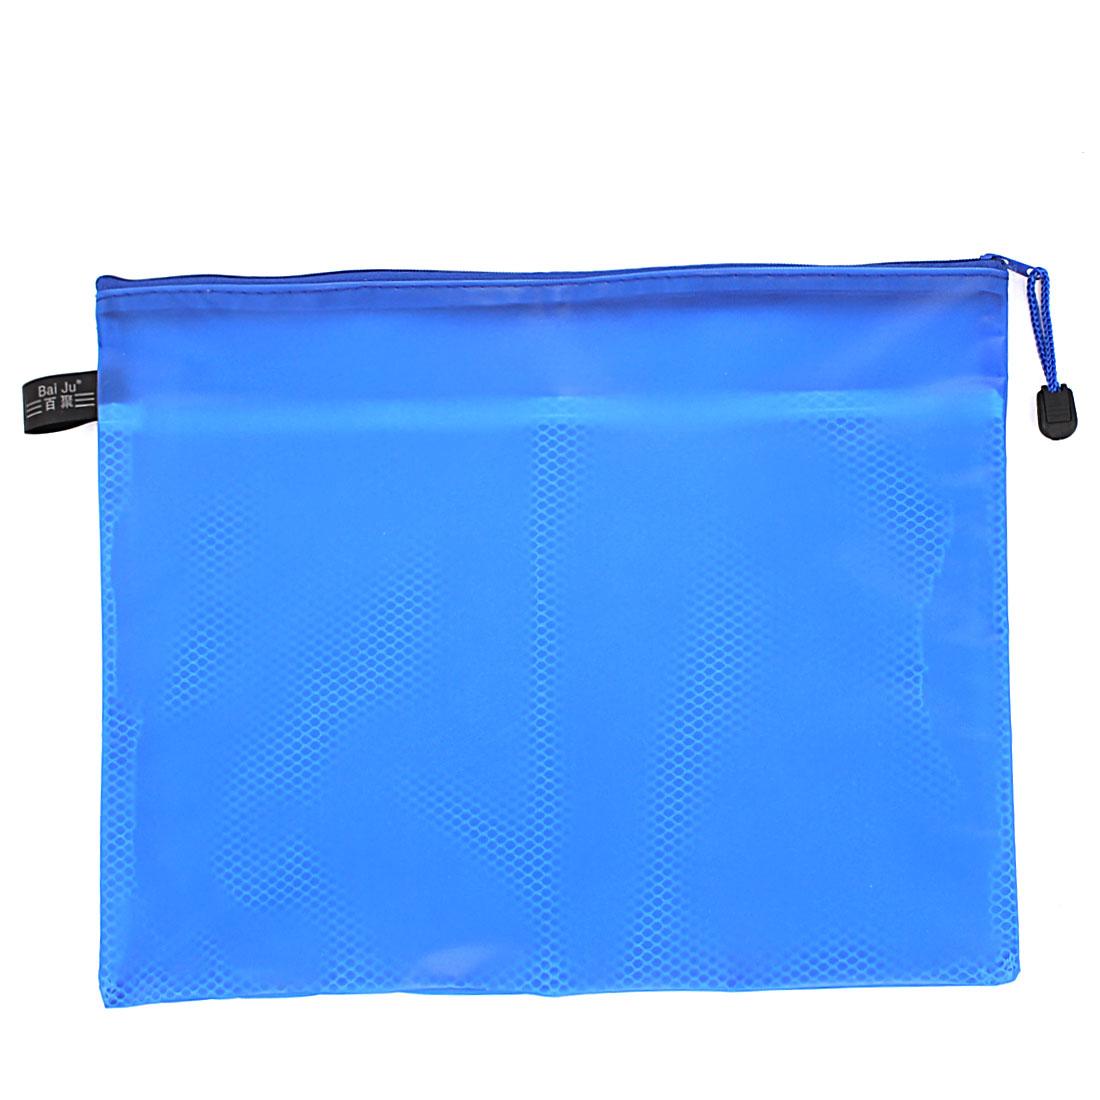 Blue Zipper Closure Double Layers Paper Document File Pen Bag Folder Holder Organizer Storage w Strap